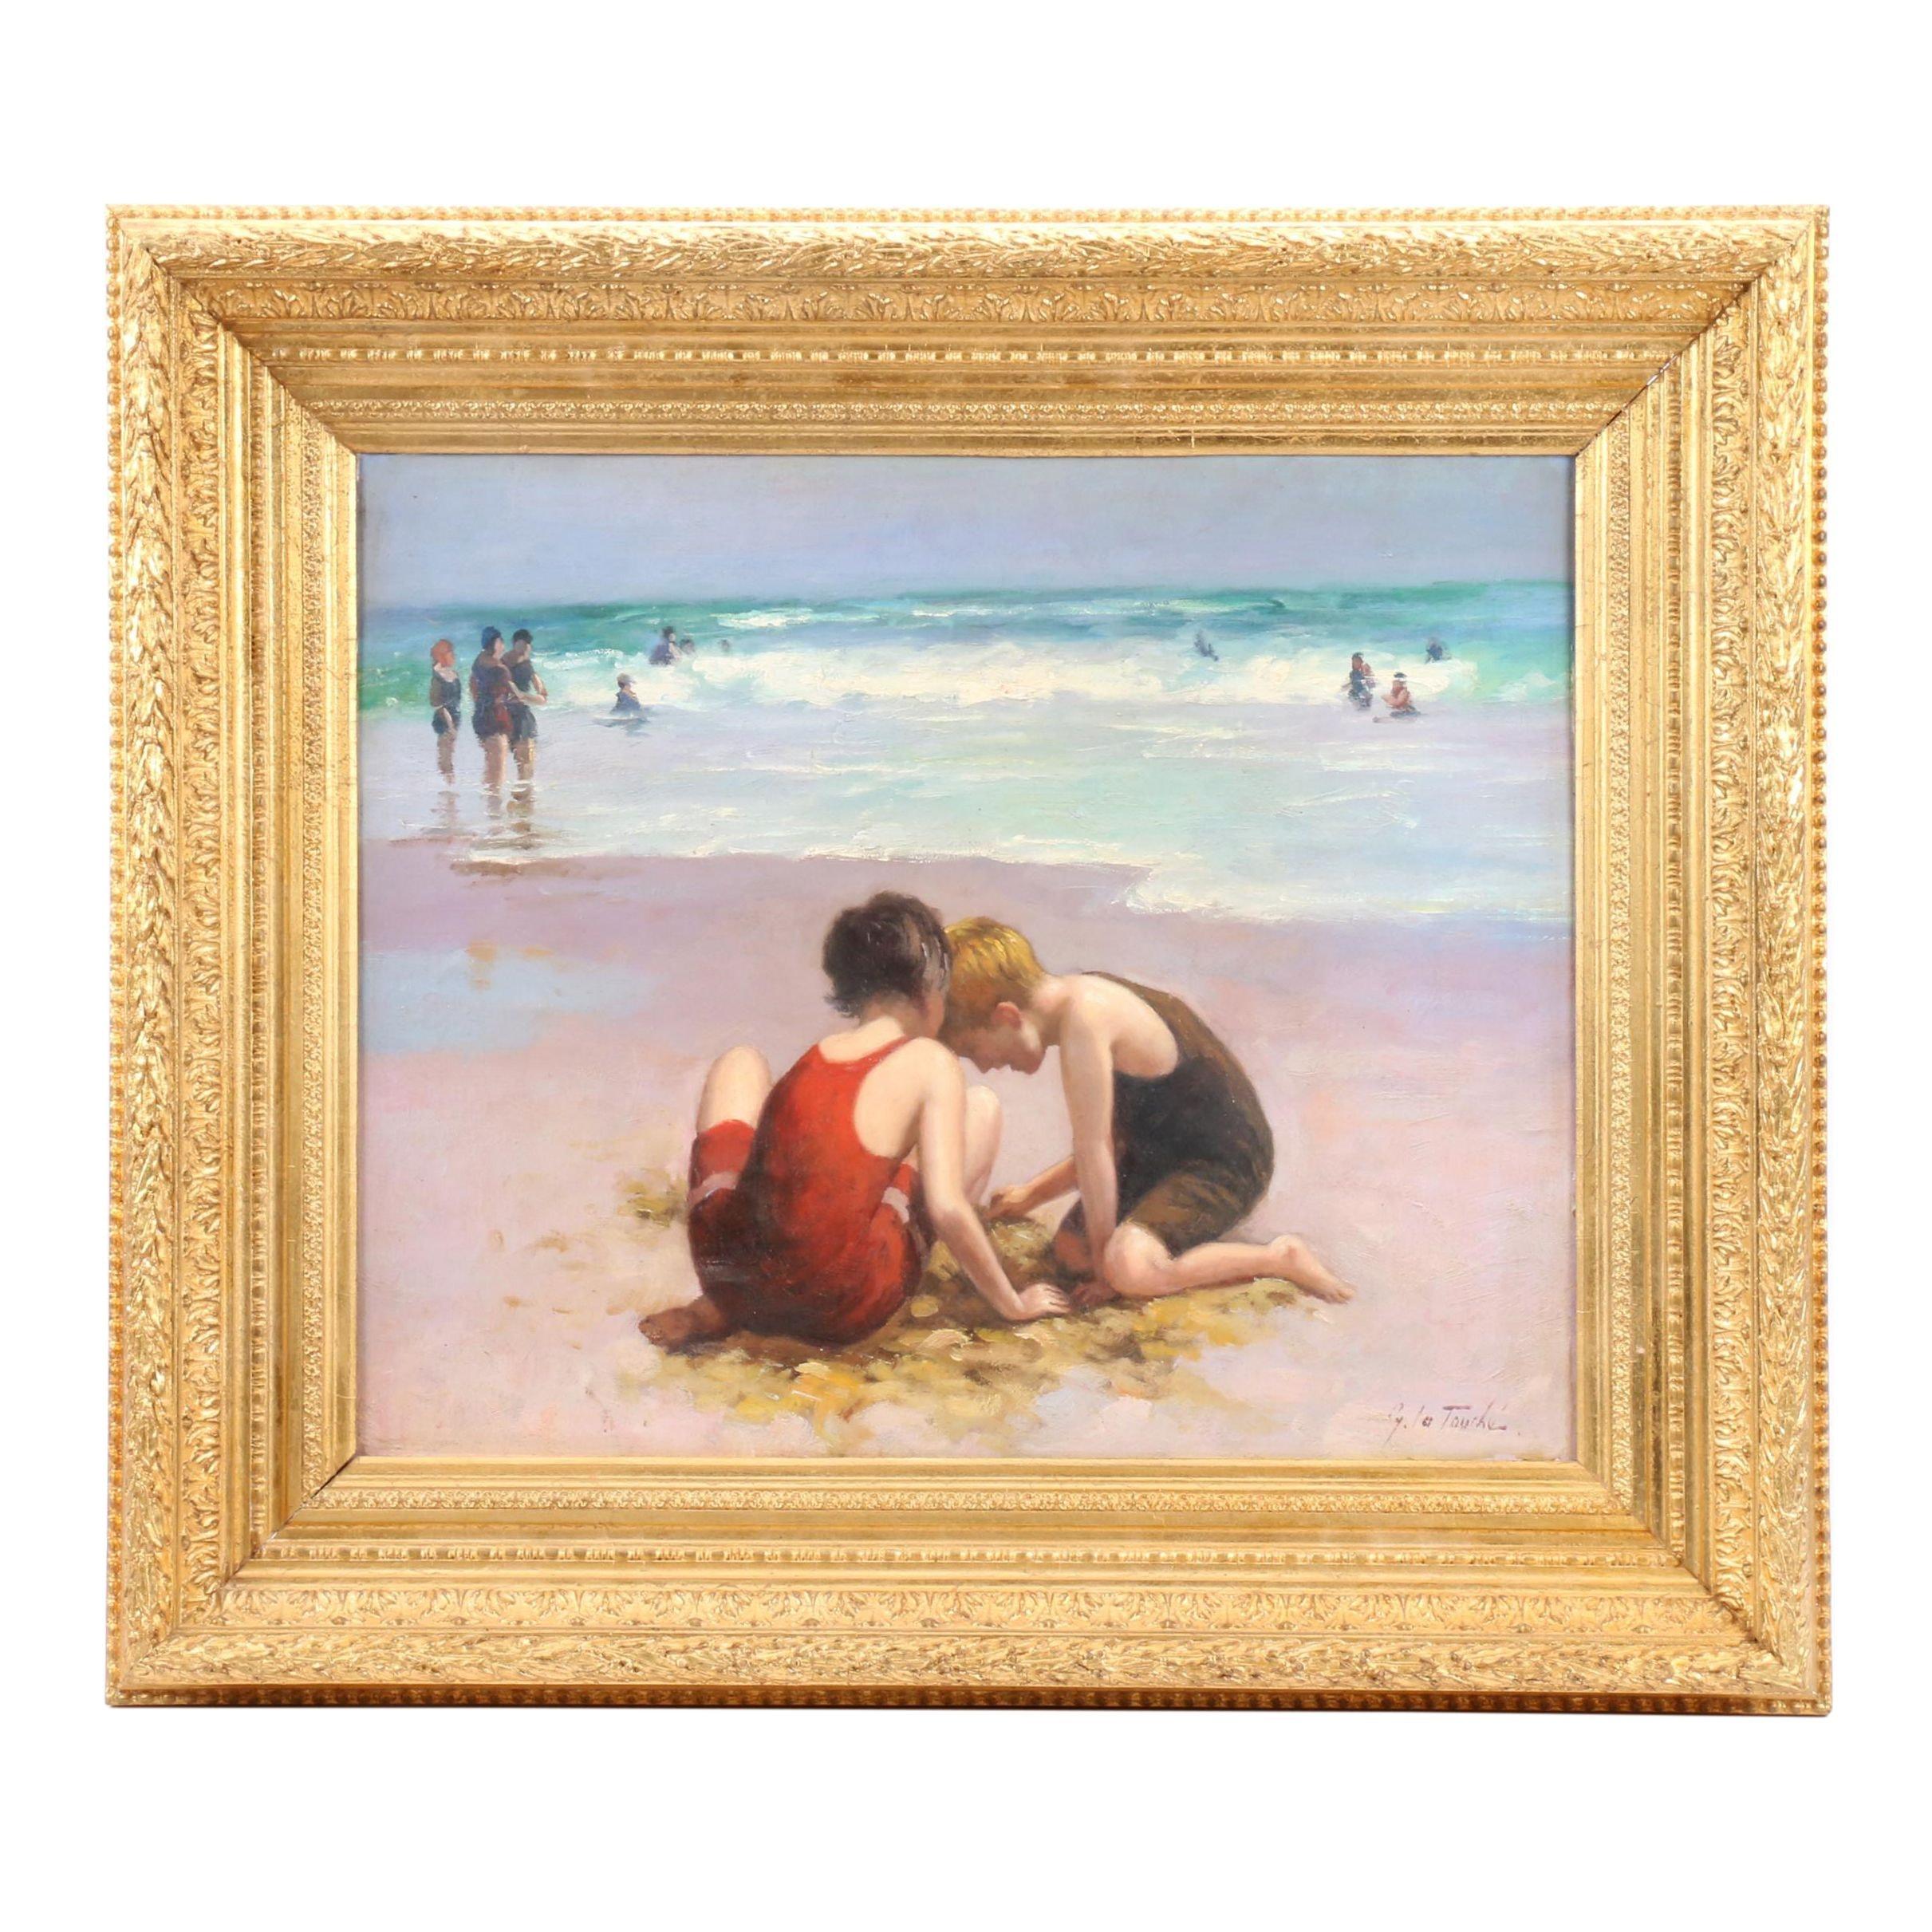 G. La Touche Oil Painting of Boys on Beach